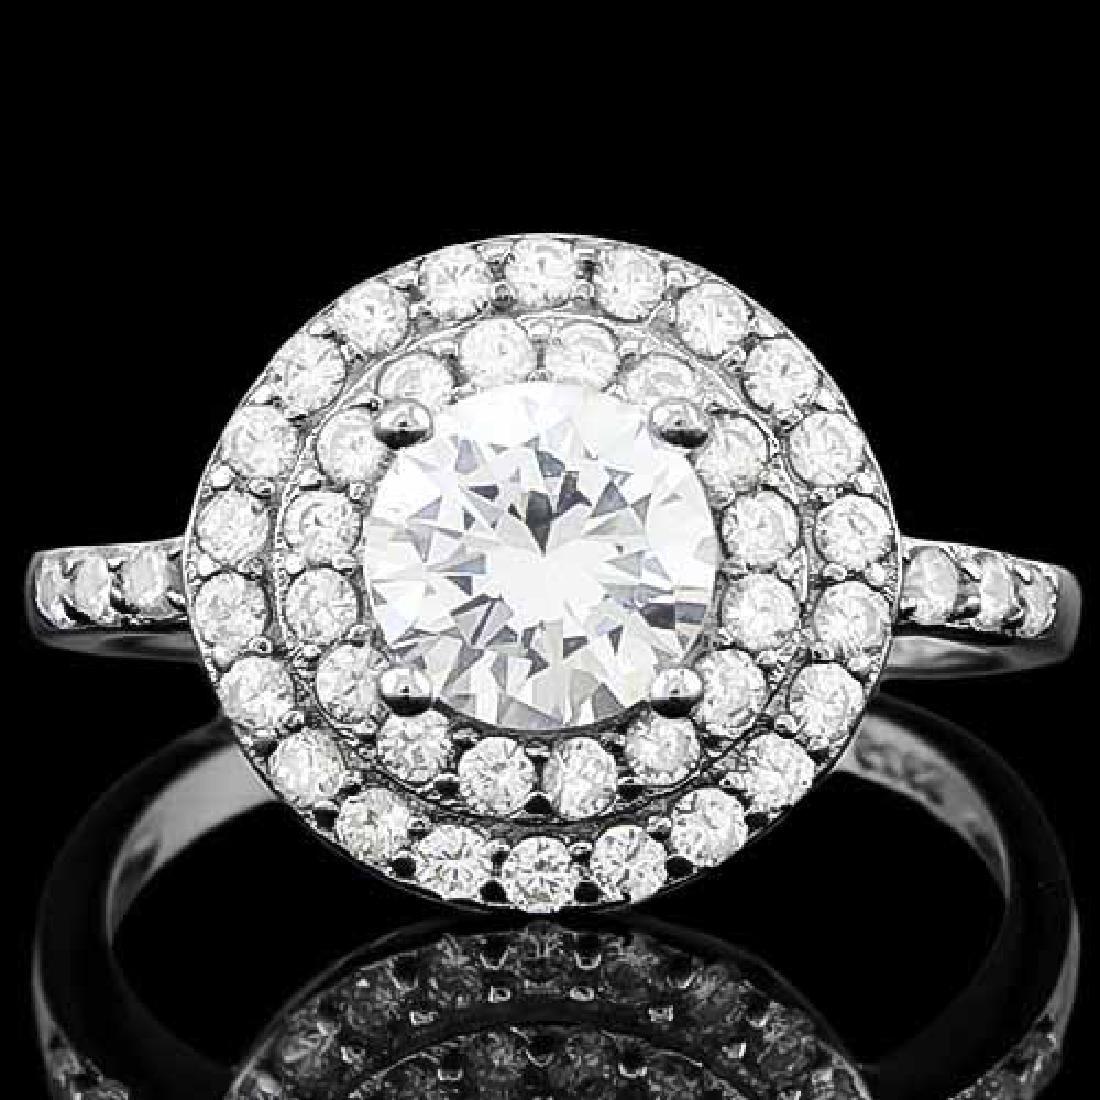 1 4/5 CARAT (53 PCS) FLAWLESS CREATED DIAMOND 925 STERL